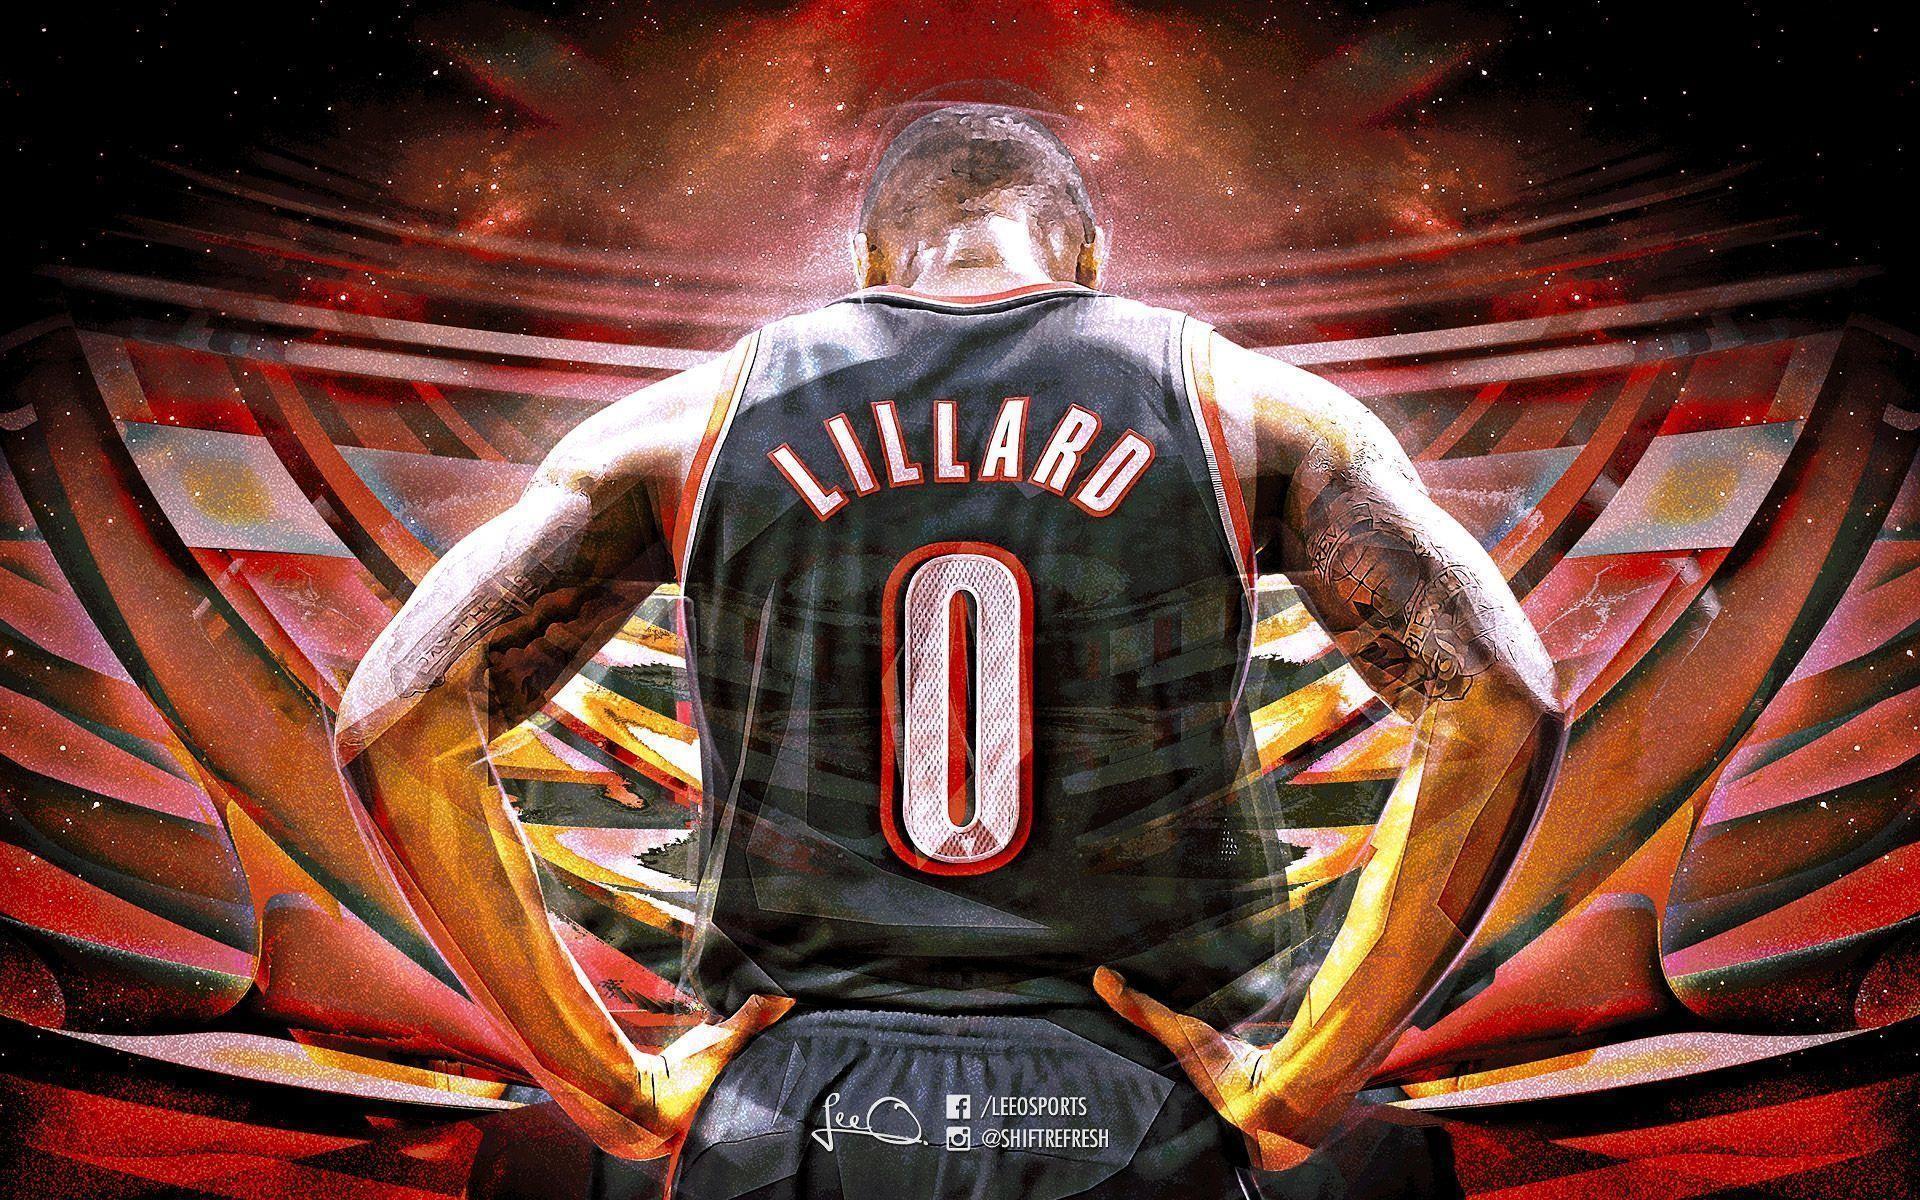 Portland Trailblazers Wallpapers | Basketball Wallpapers at .